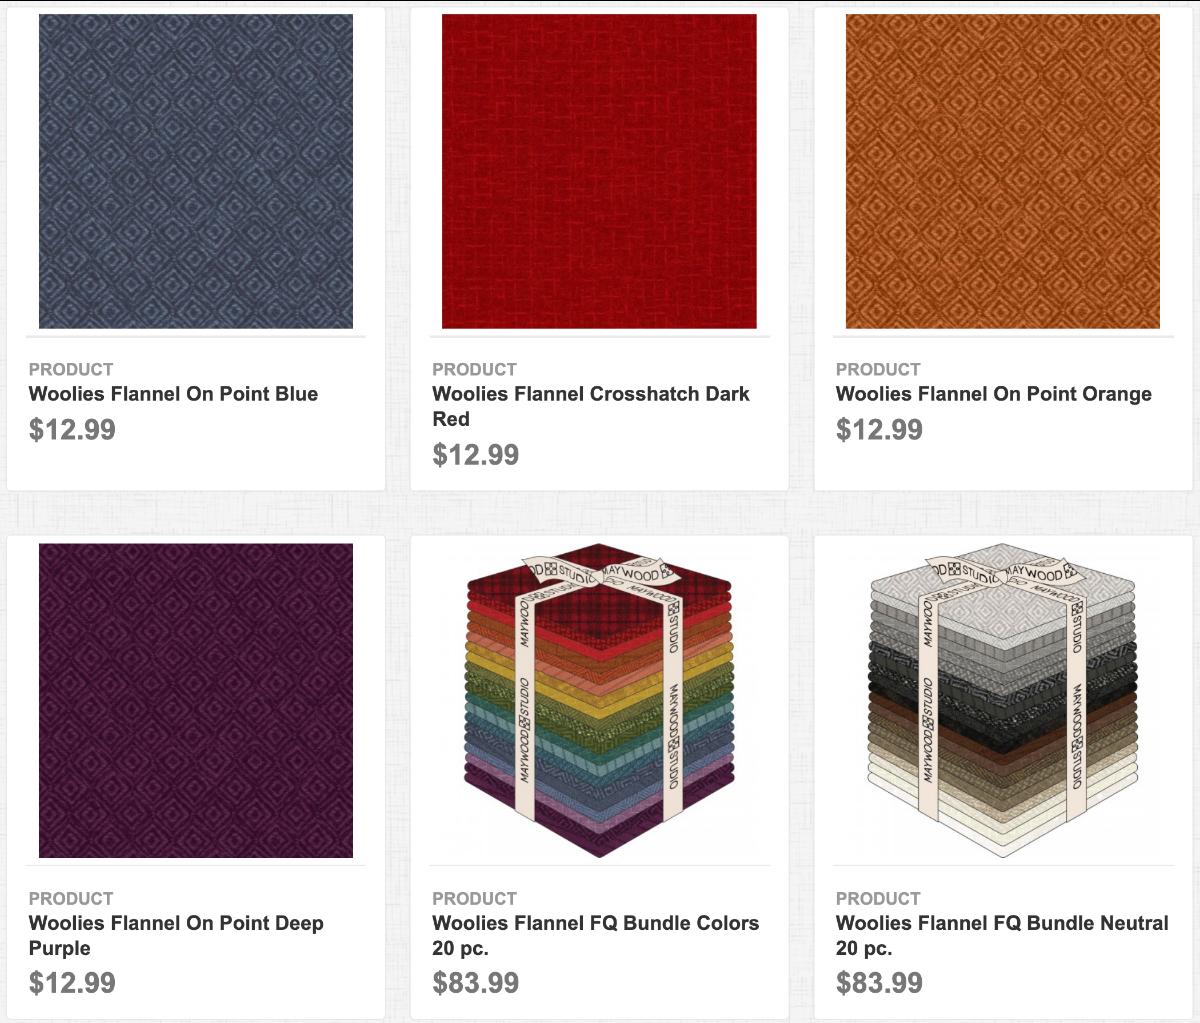 Woolies Flannel On Point Blue, Crosshatch Dark Red, On Point Orange, On Point Deep Purple, FQ Bundle Colors 20pc., & FQ Bundle Neutral 20pc.